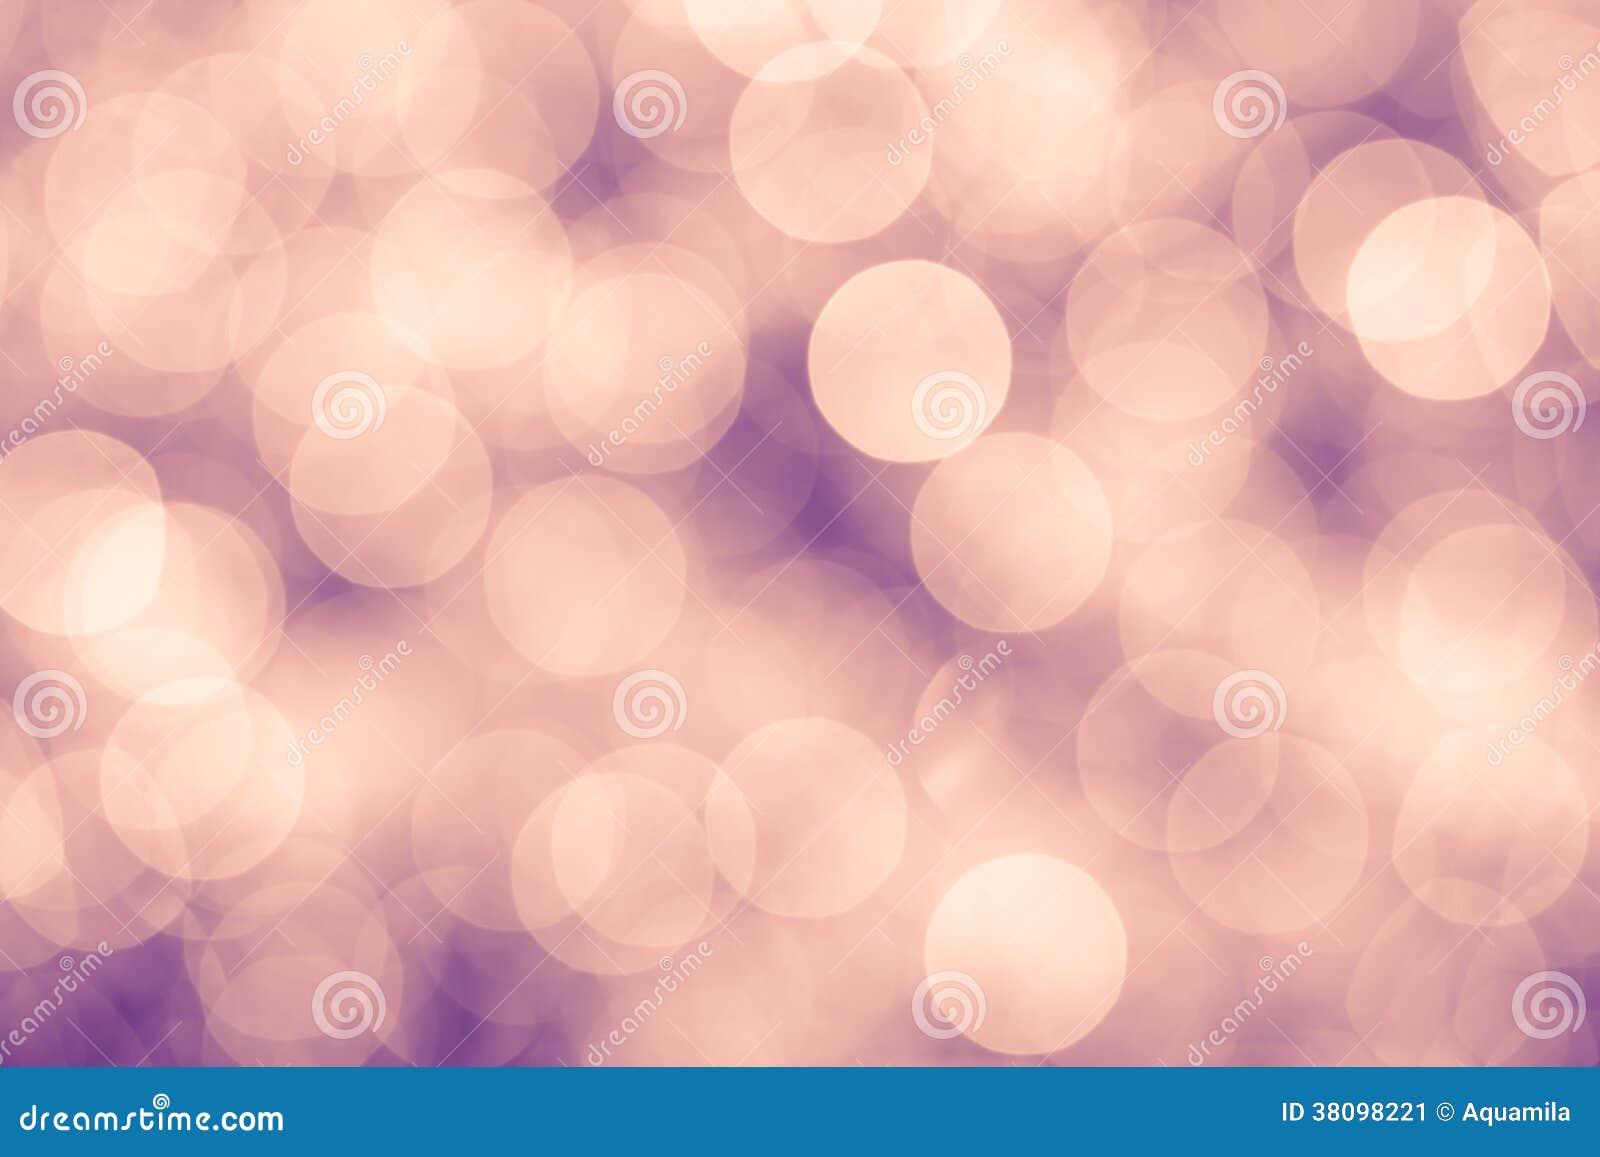 Pink And Purple Vintage Background With Bokeh Defocused